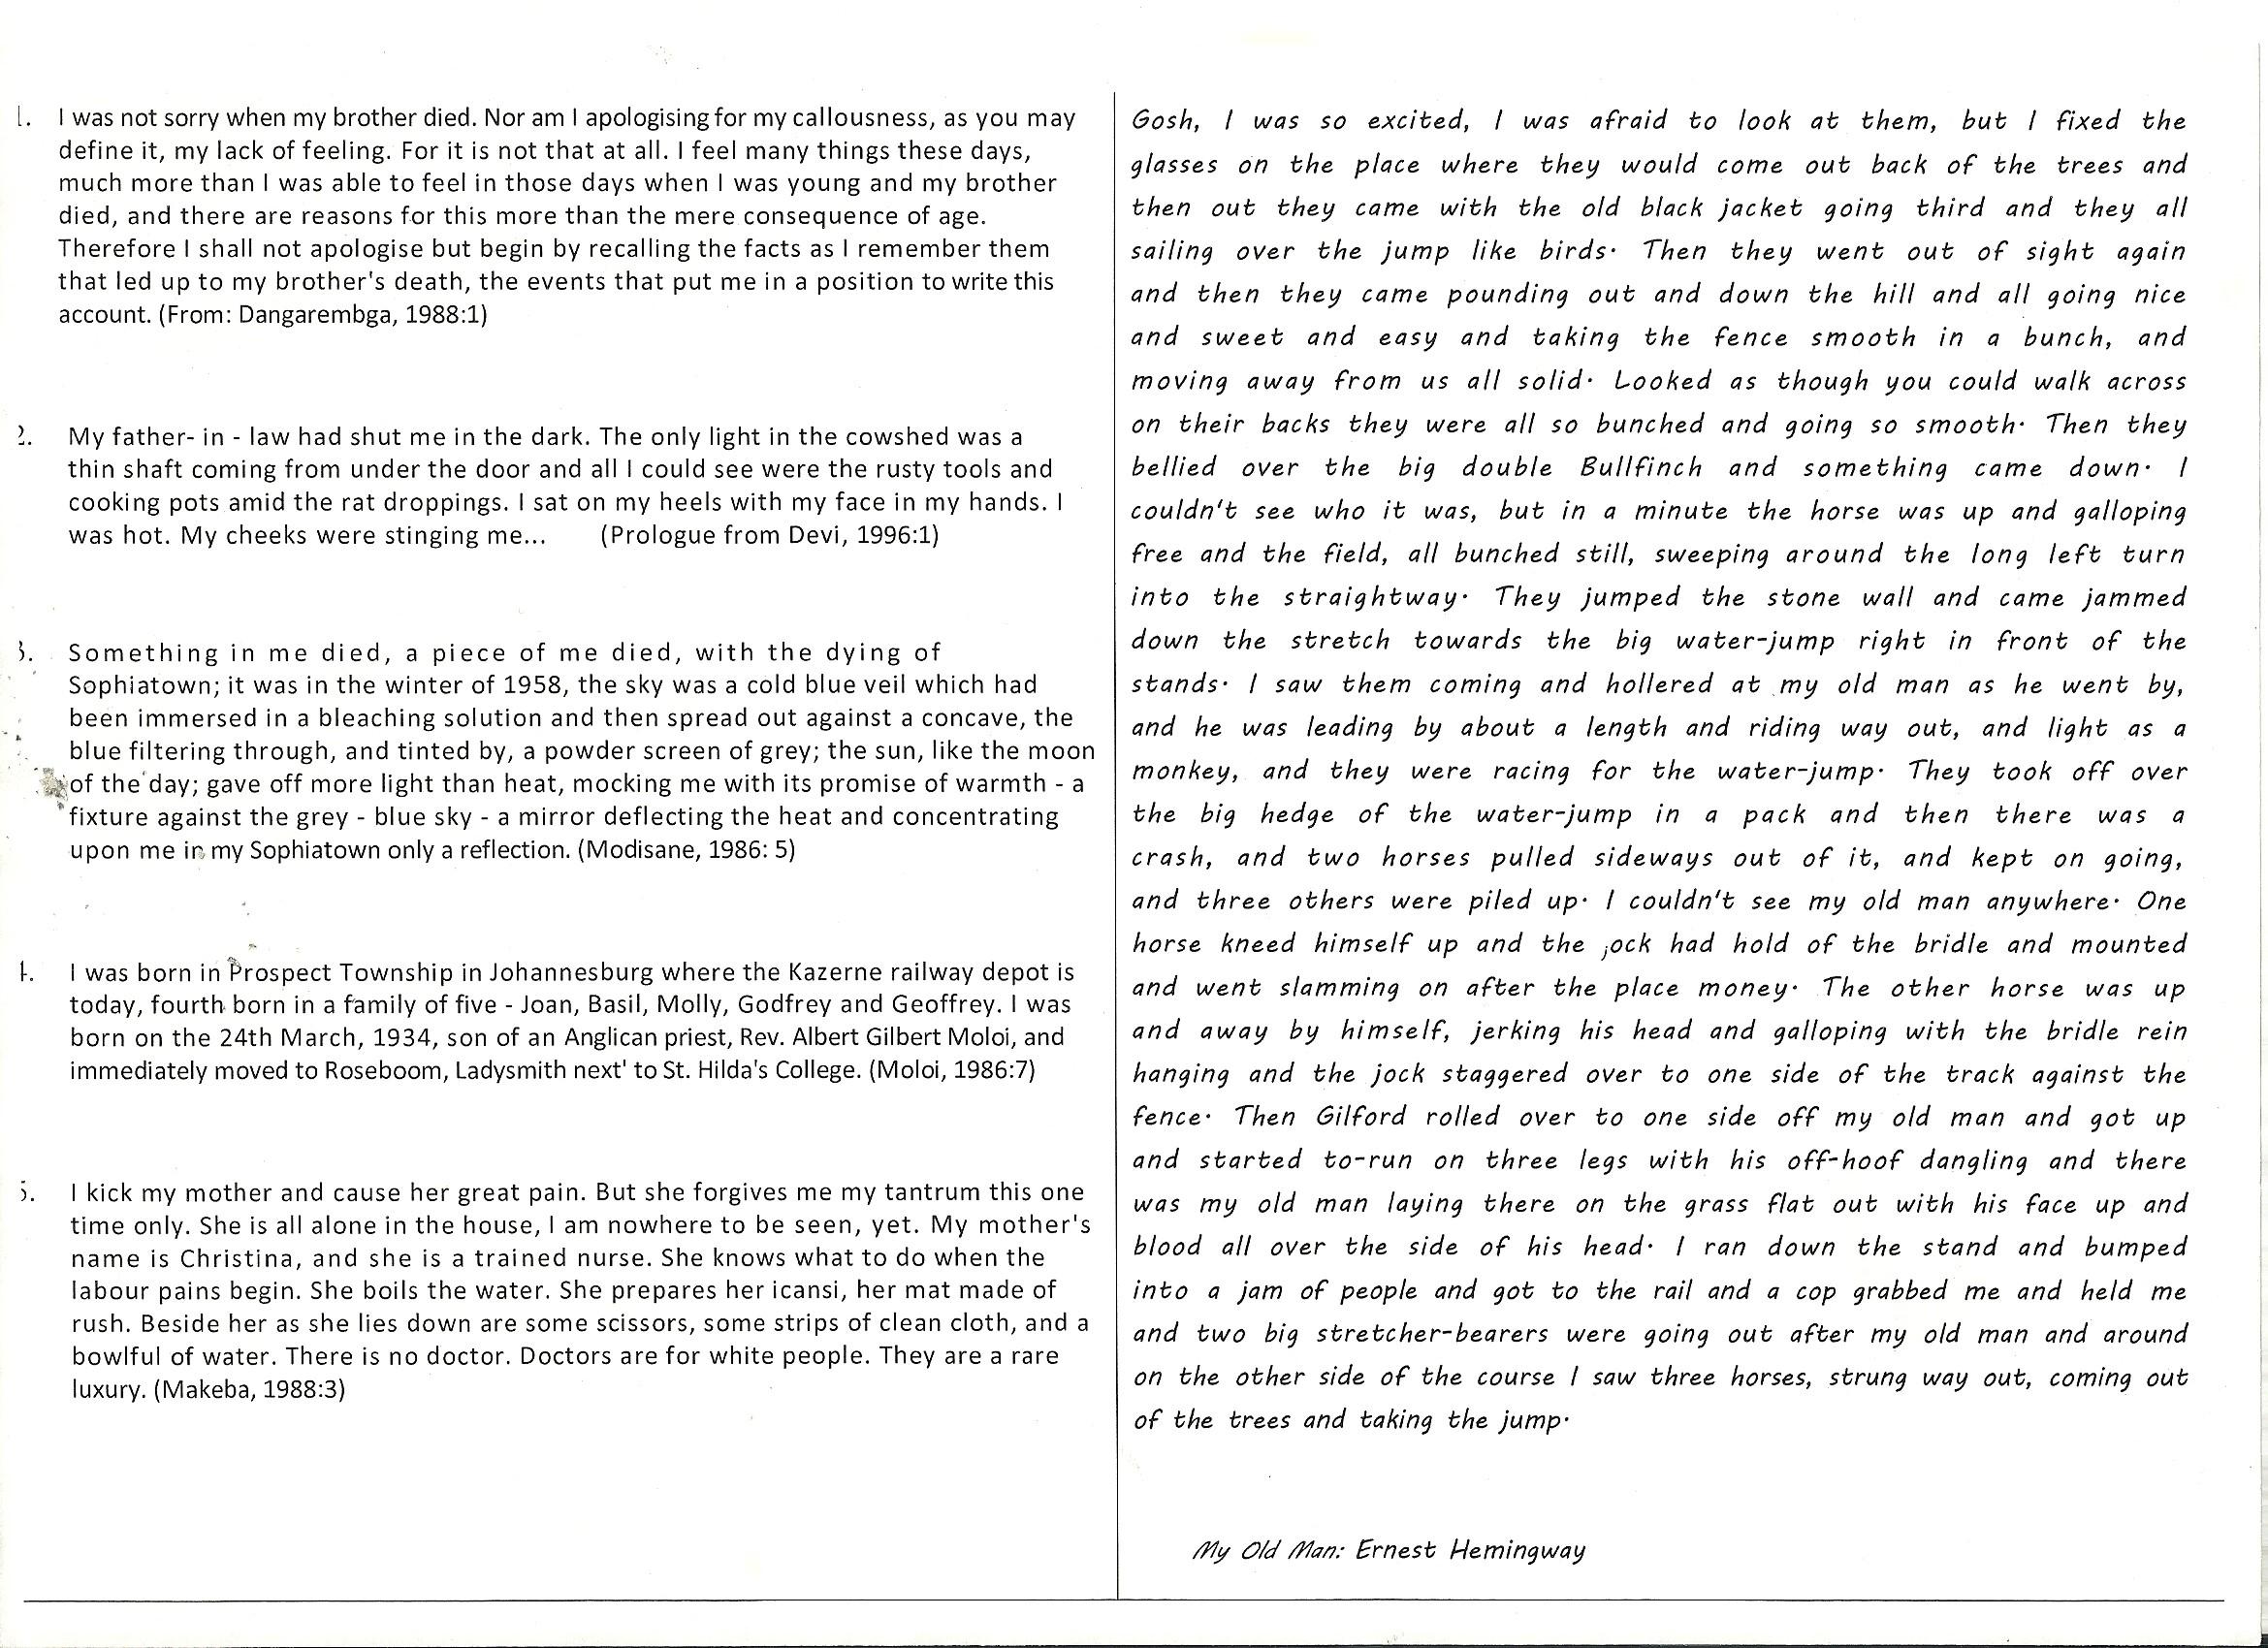 013 Good Vs Essay Example Writer Outstanding Com My Writer.com Pro Writing Reviews Comparative Full